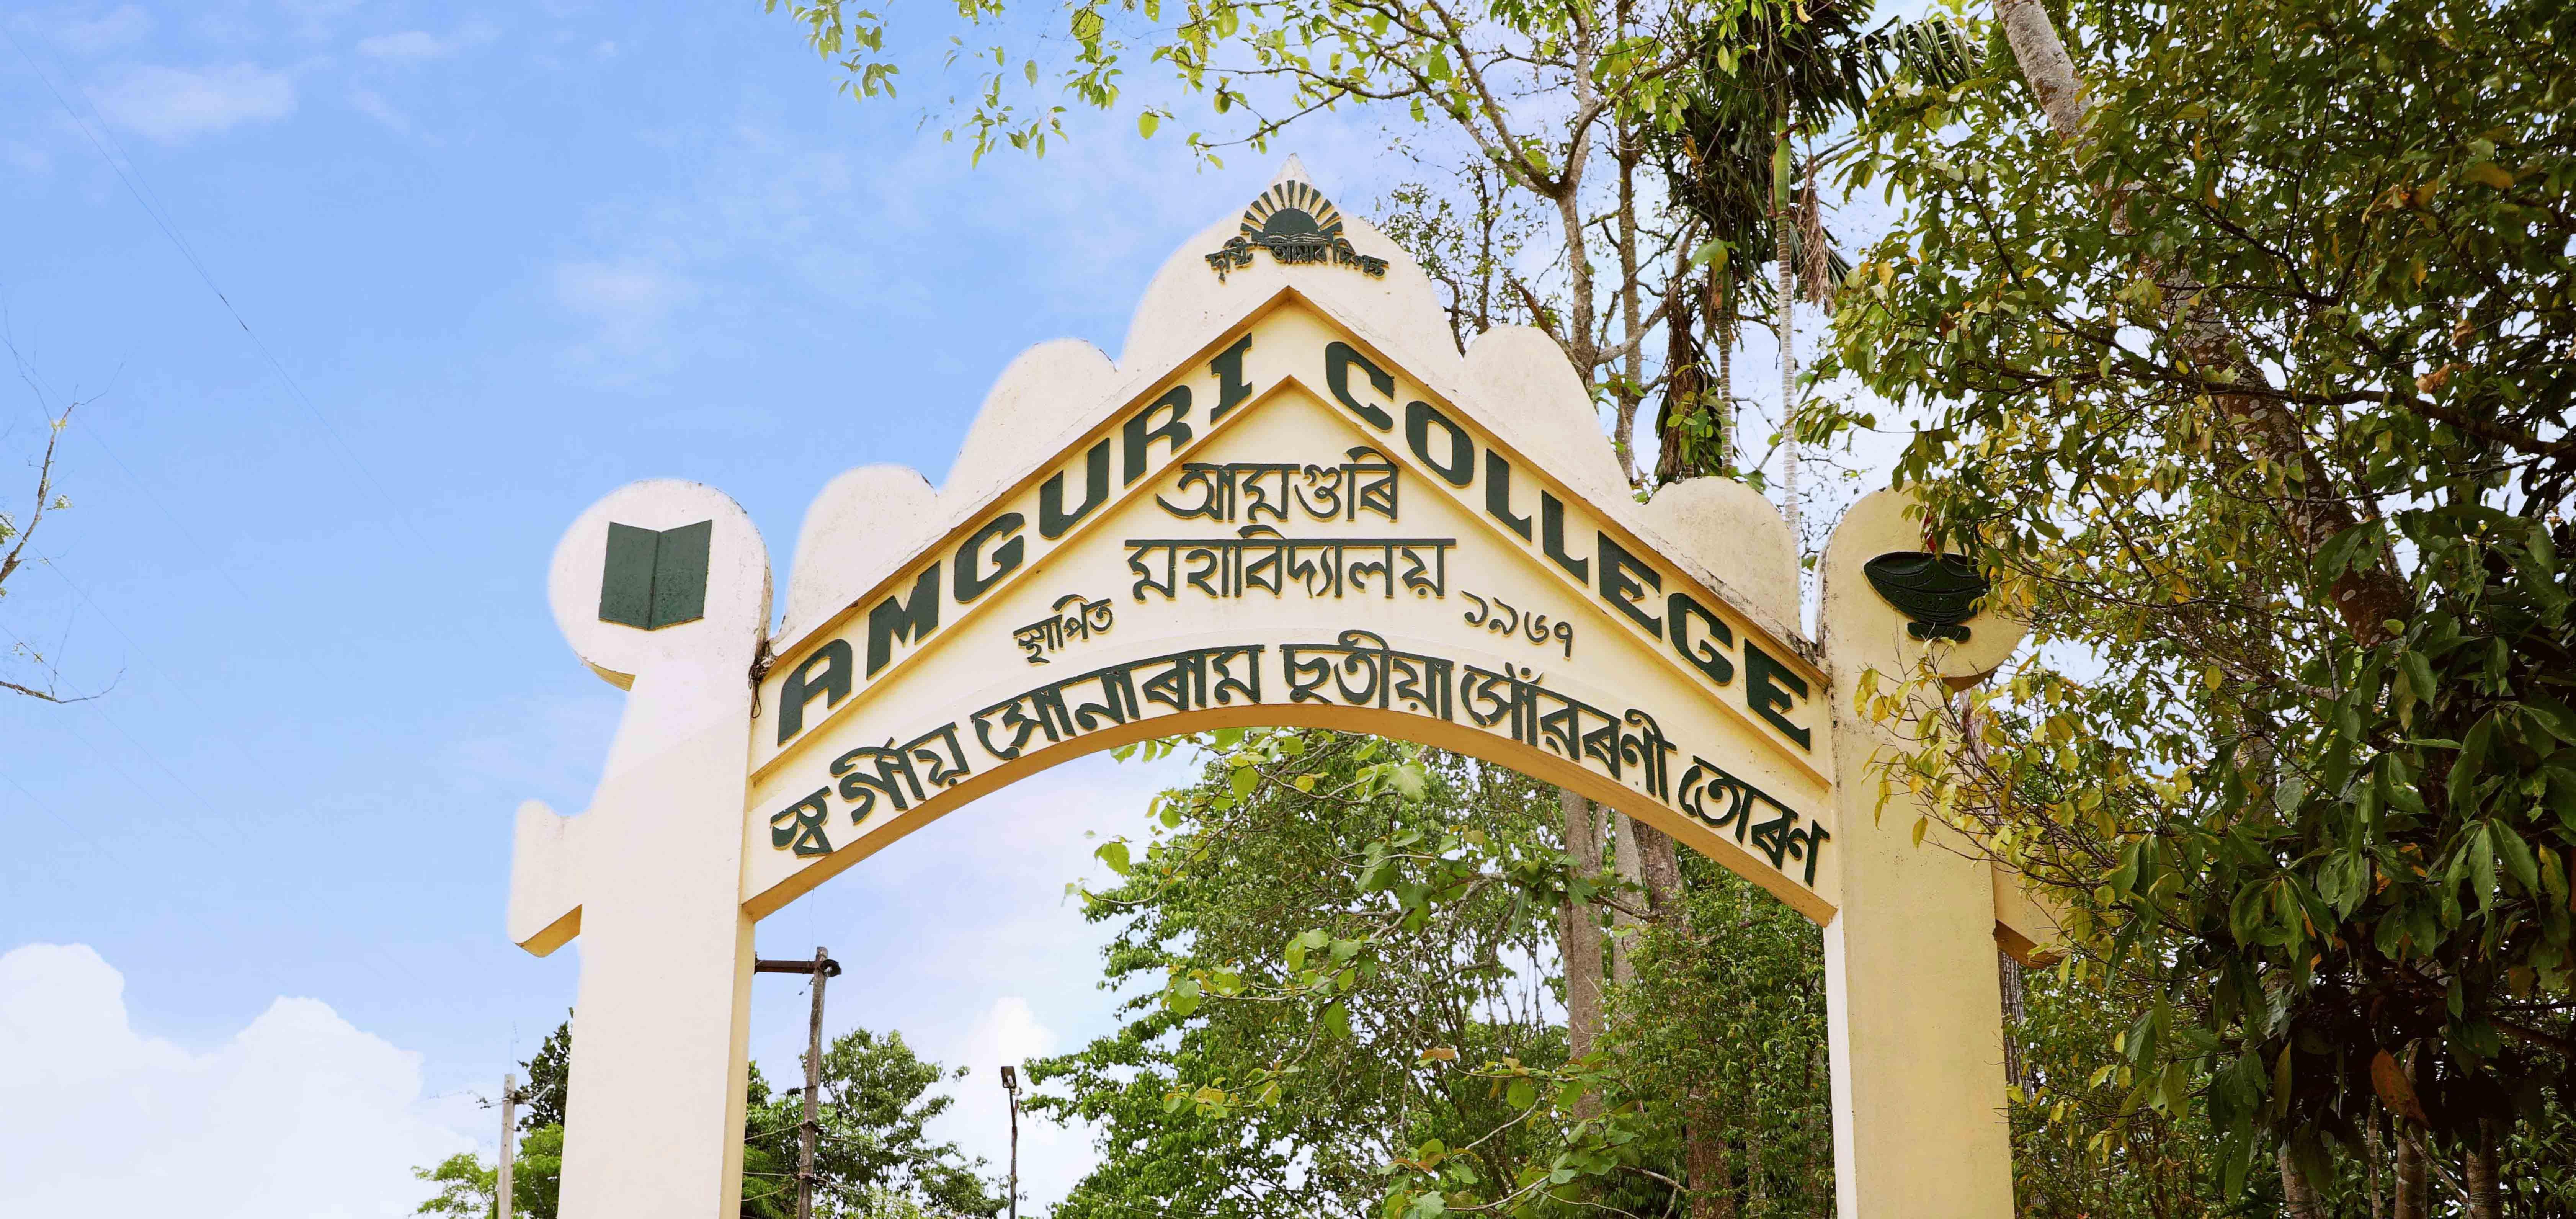 Amguri College